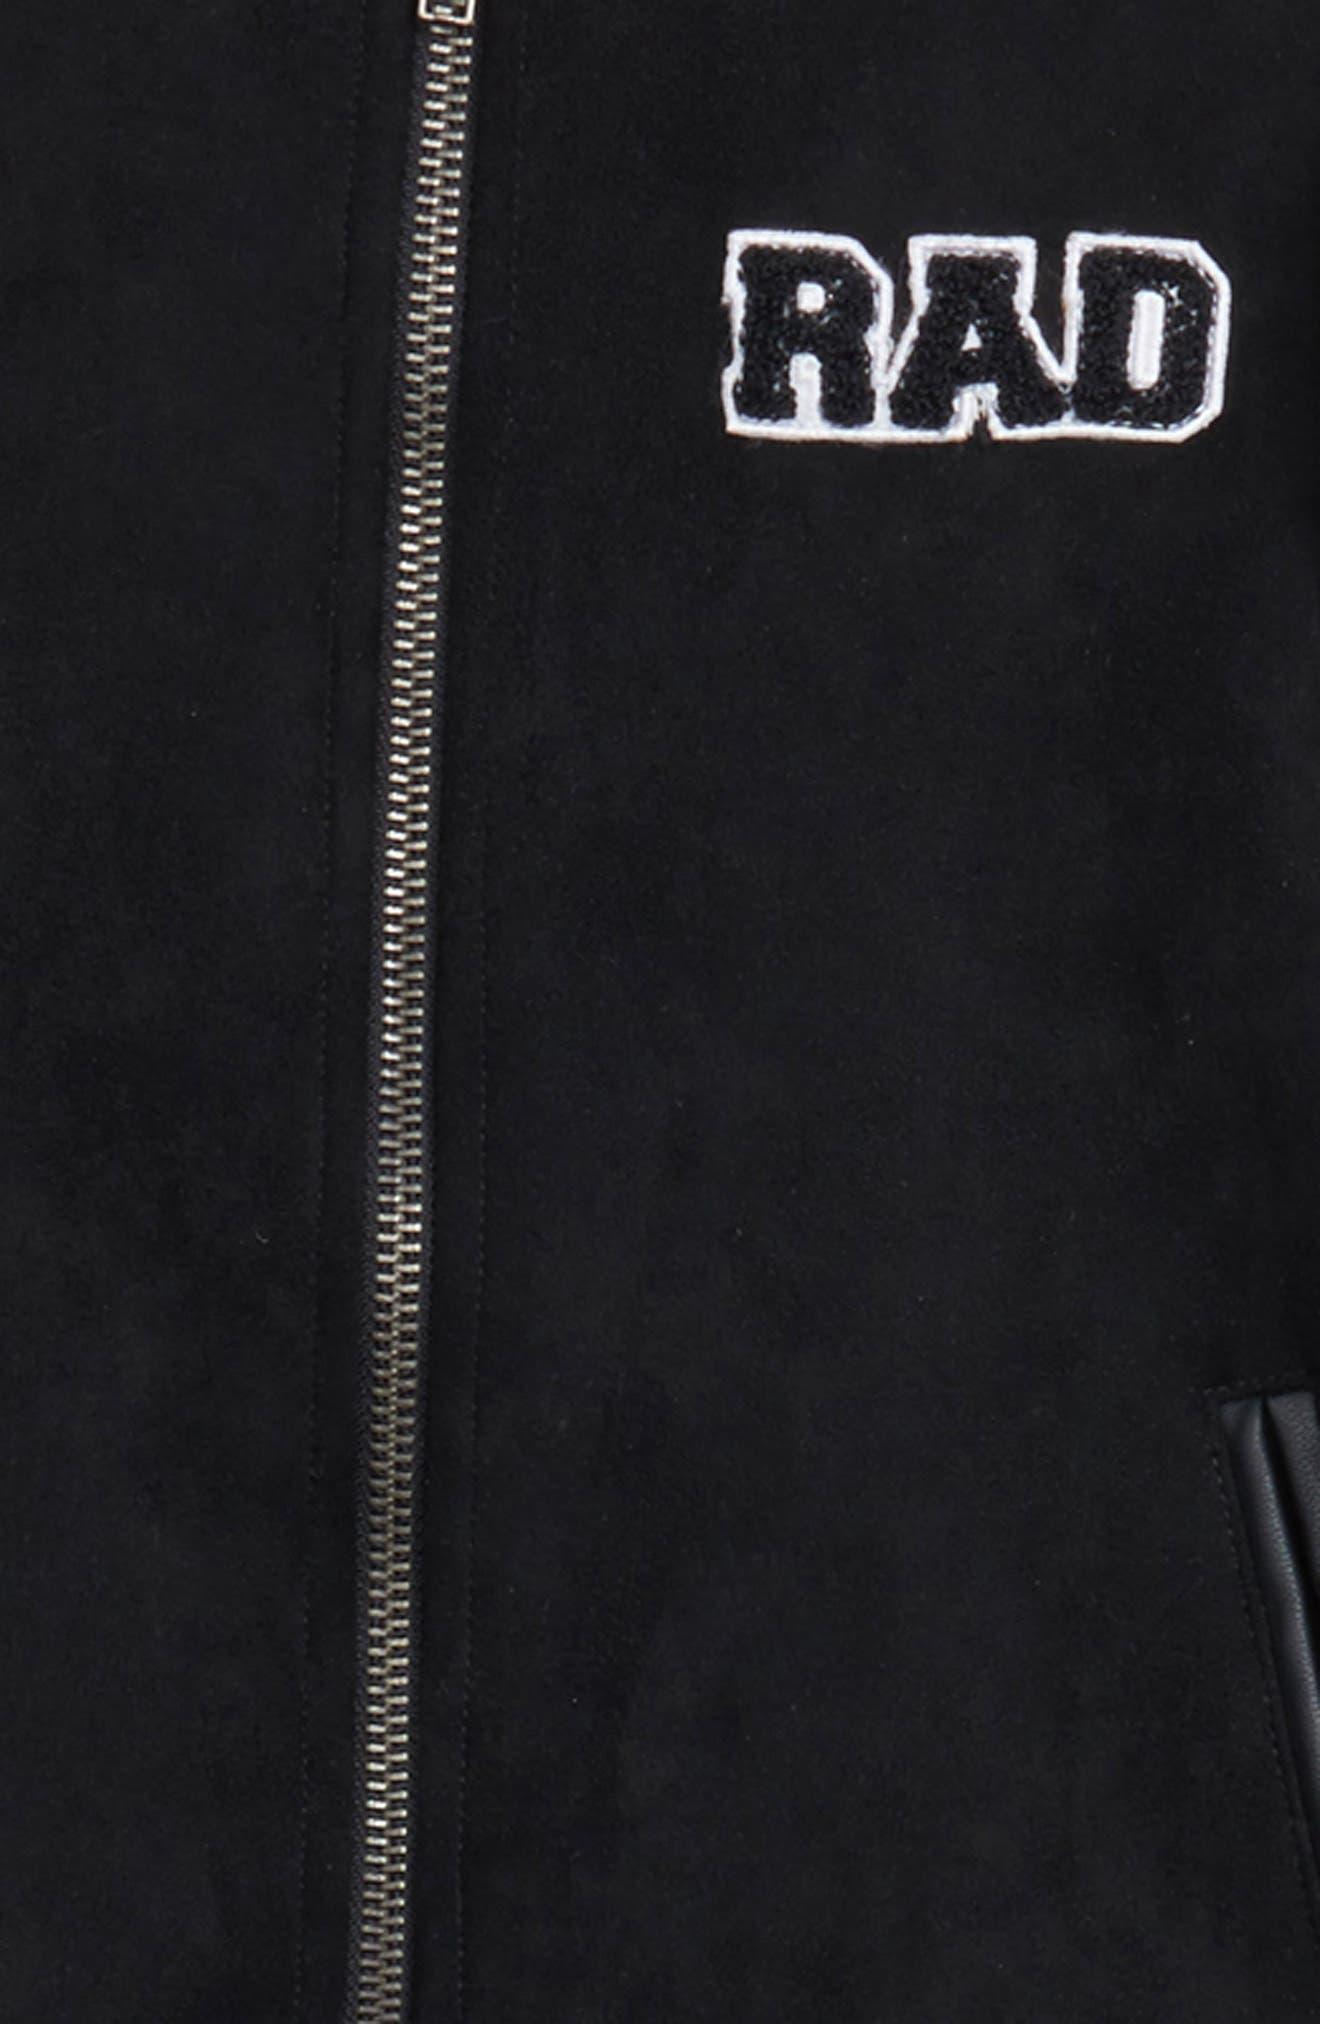 Mixed Media Bomber Jacket,                             Alternate thumbnail 3, color,                             Black